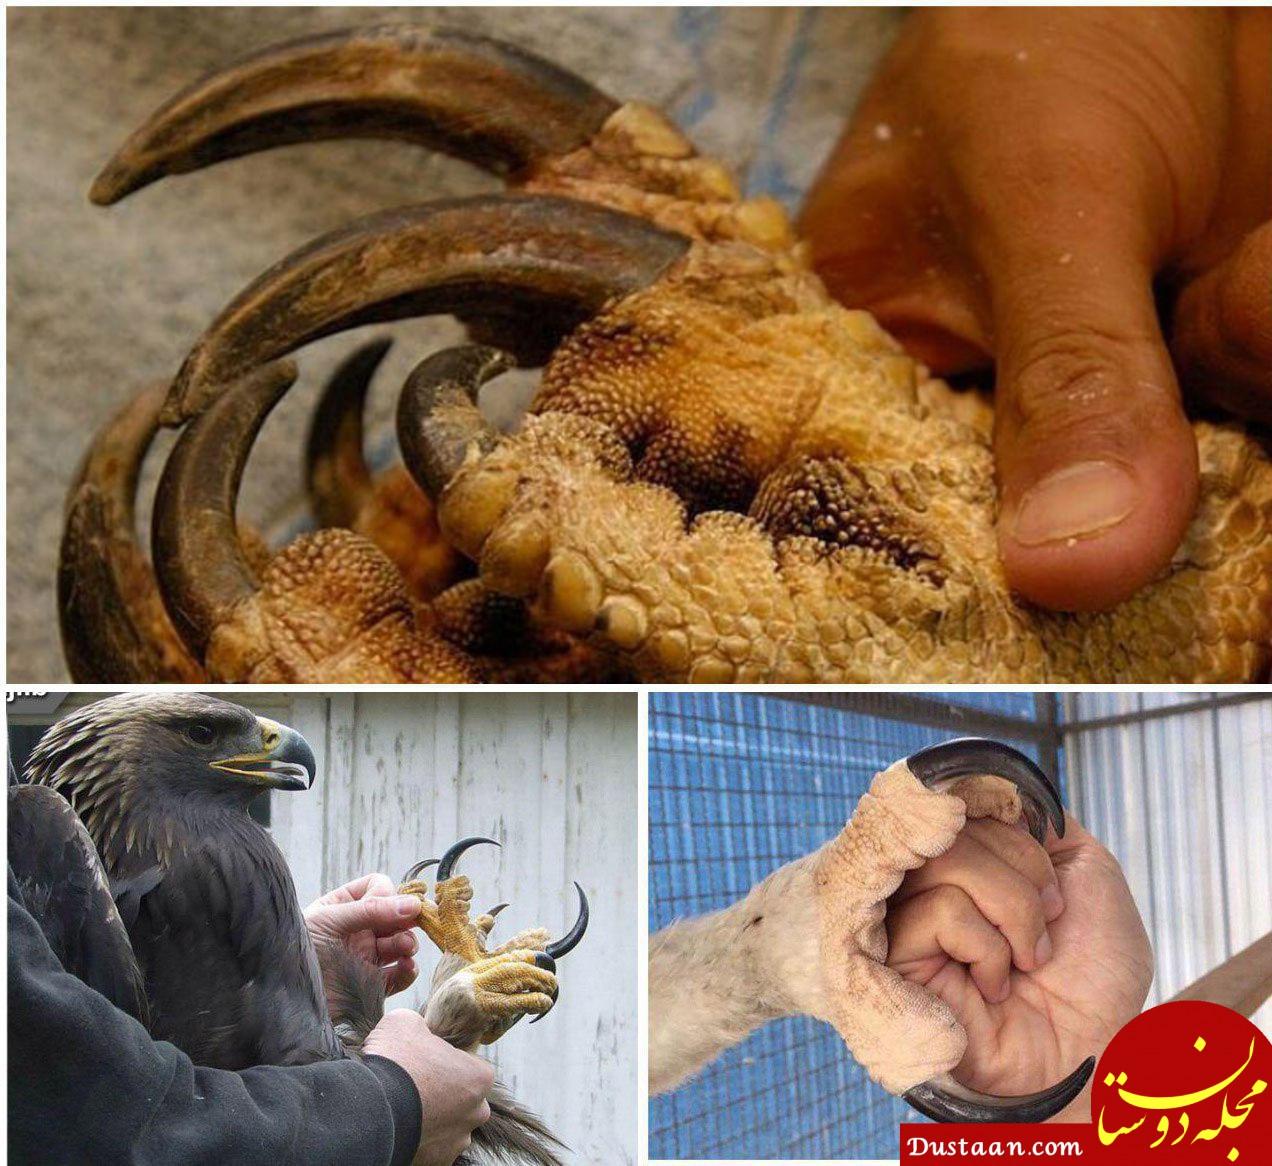 www.dustaan.com بزرگترین عقاب جهان که به انسان به چشم یک شکار نگاه می کند! +عکس